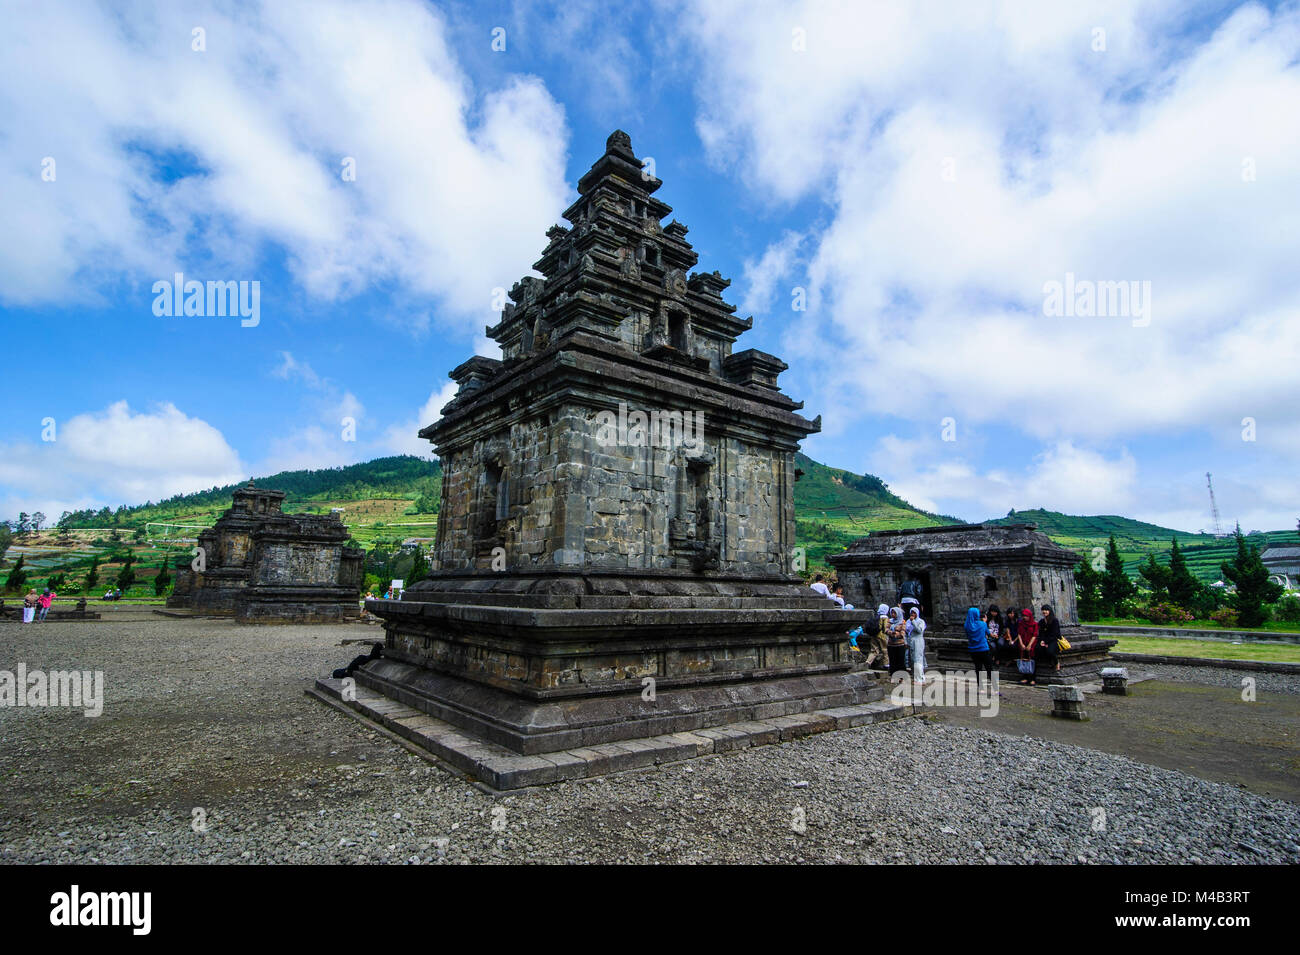 Arjuna Hindu Dieng temple complex ,Dieng Plateau,Java,Indonesia - Stock Image